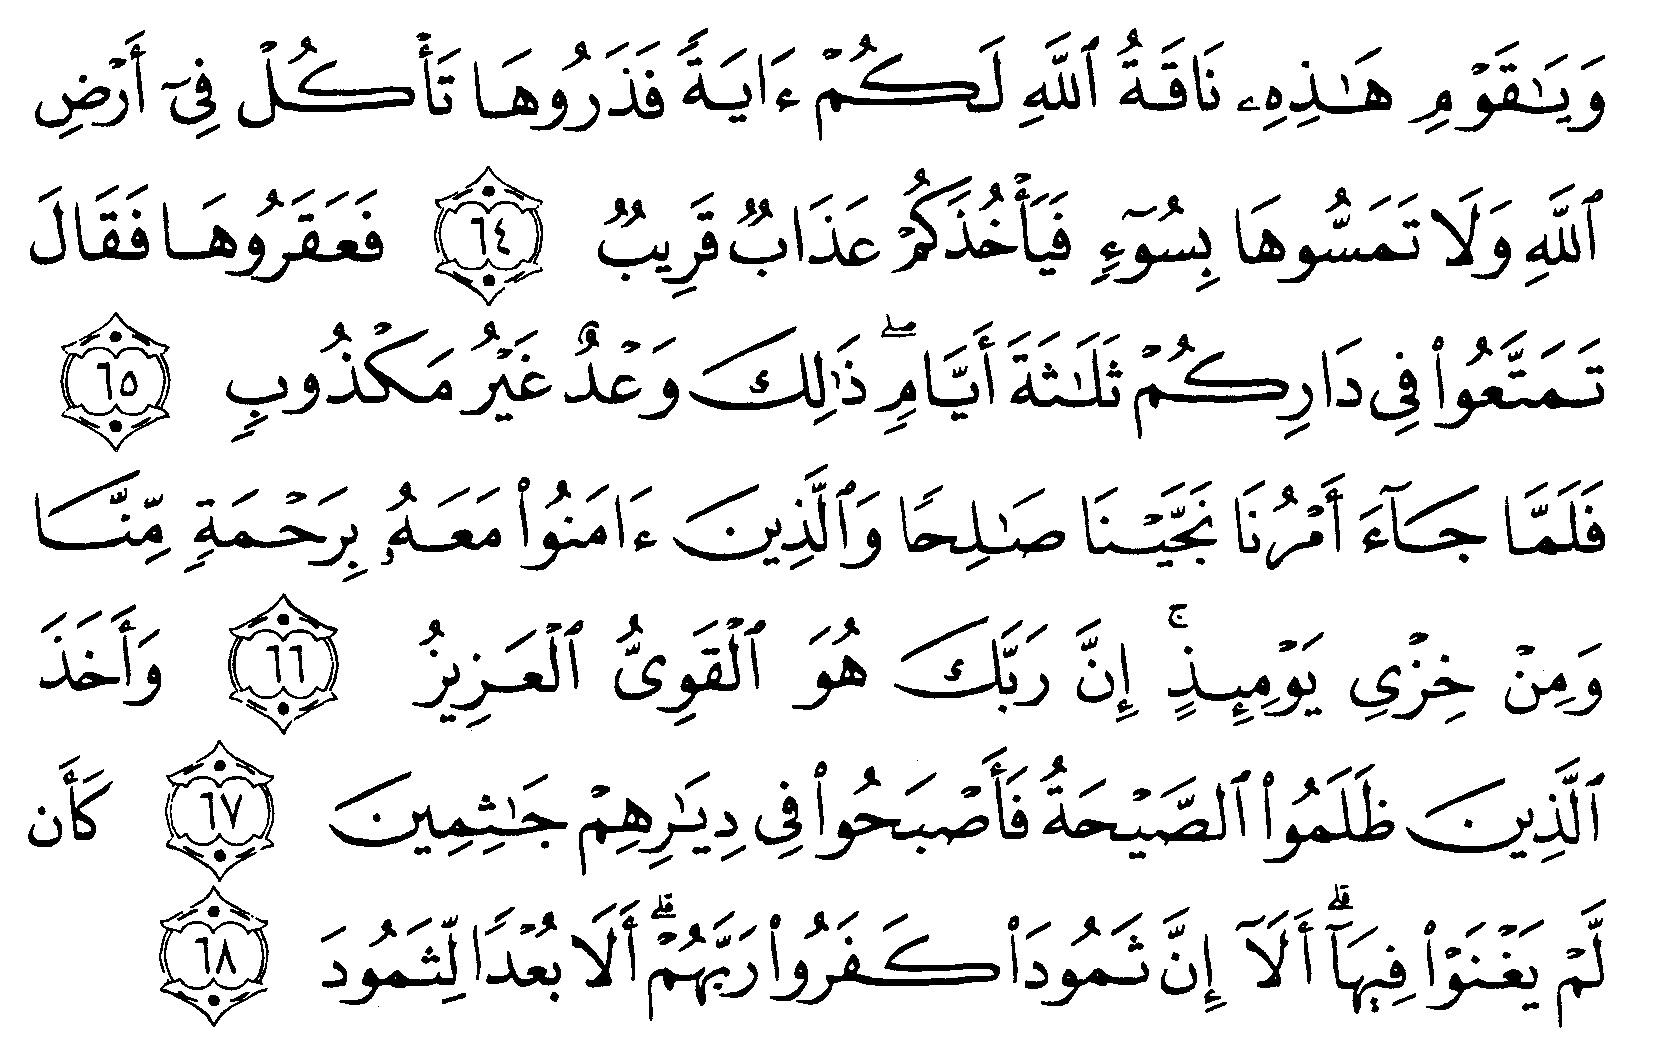 Tafsir Ibnu Katsir Surah Huud Ayat 64 68 Alquranmulia